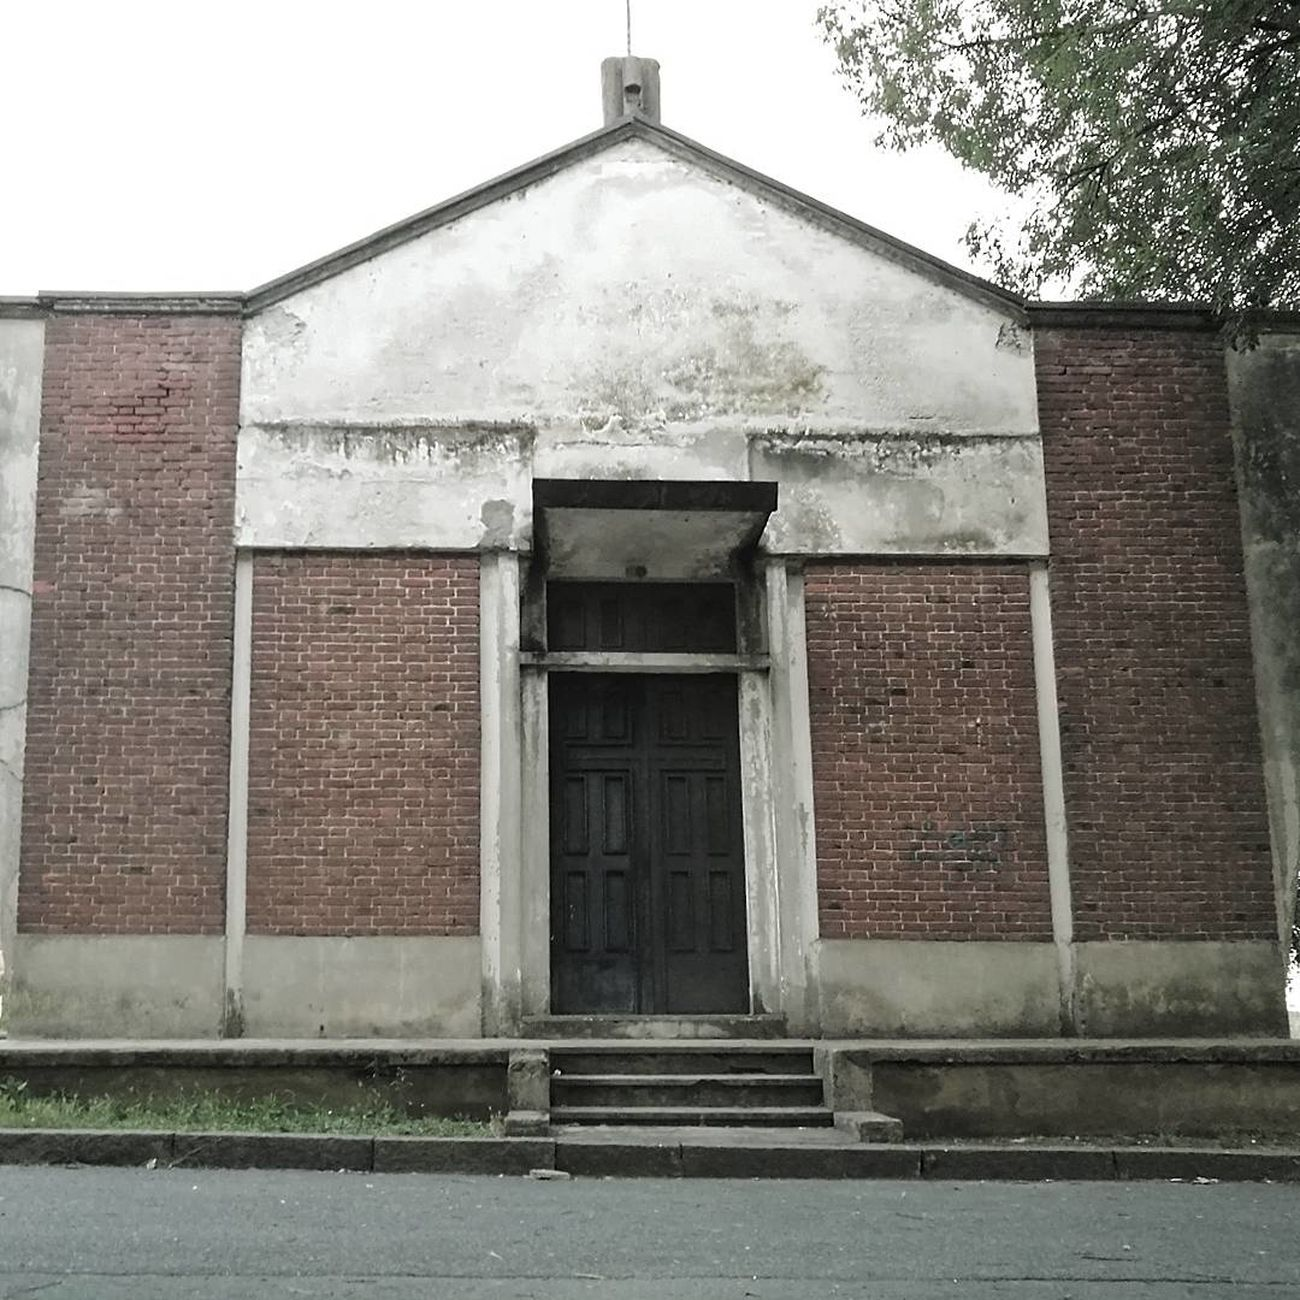 Building Exterior Architecture Façade Church Outdoors Decay Vintage Photo Vintage